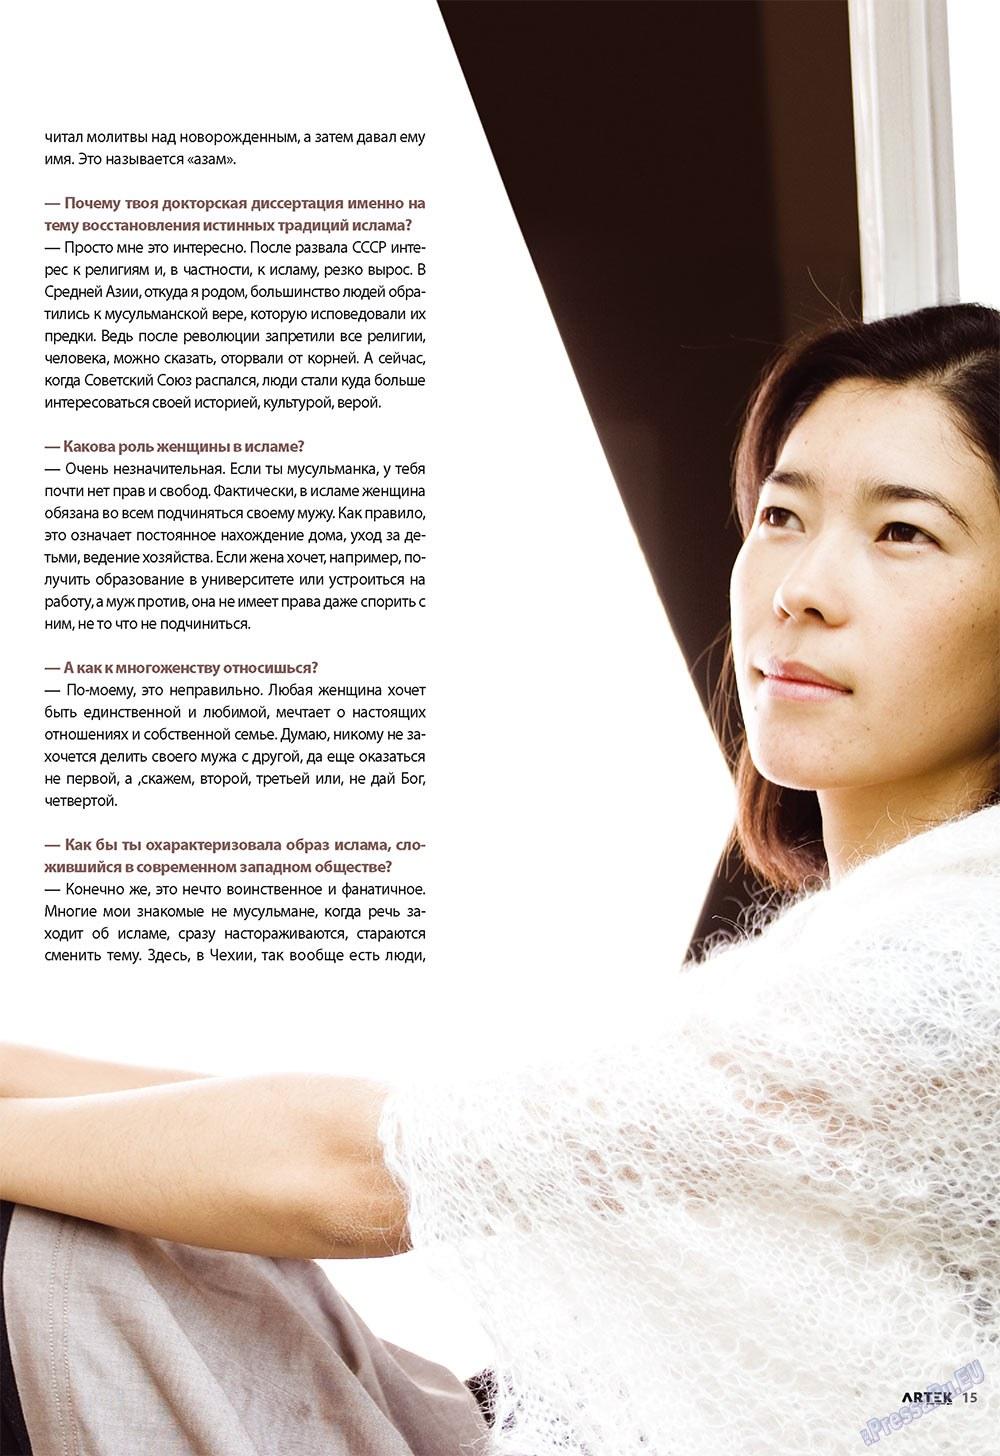 Артек (журнал). 2009 год, номер 5, стр. 15